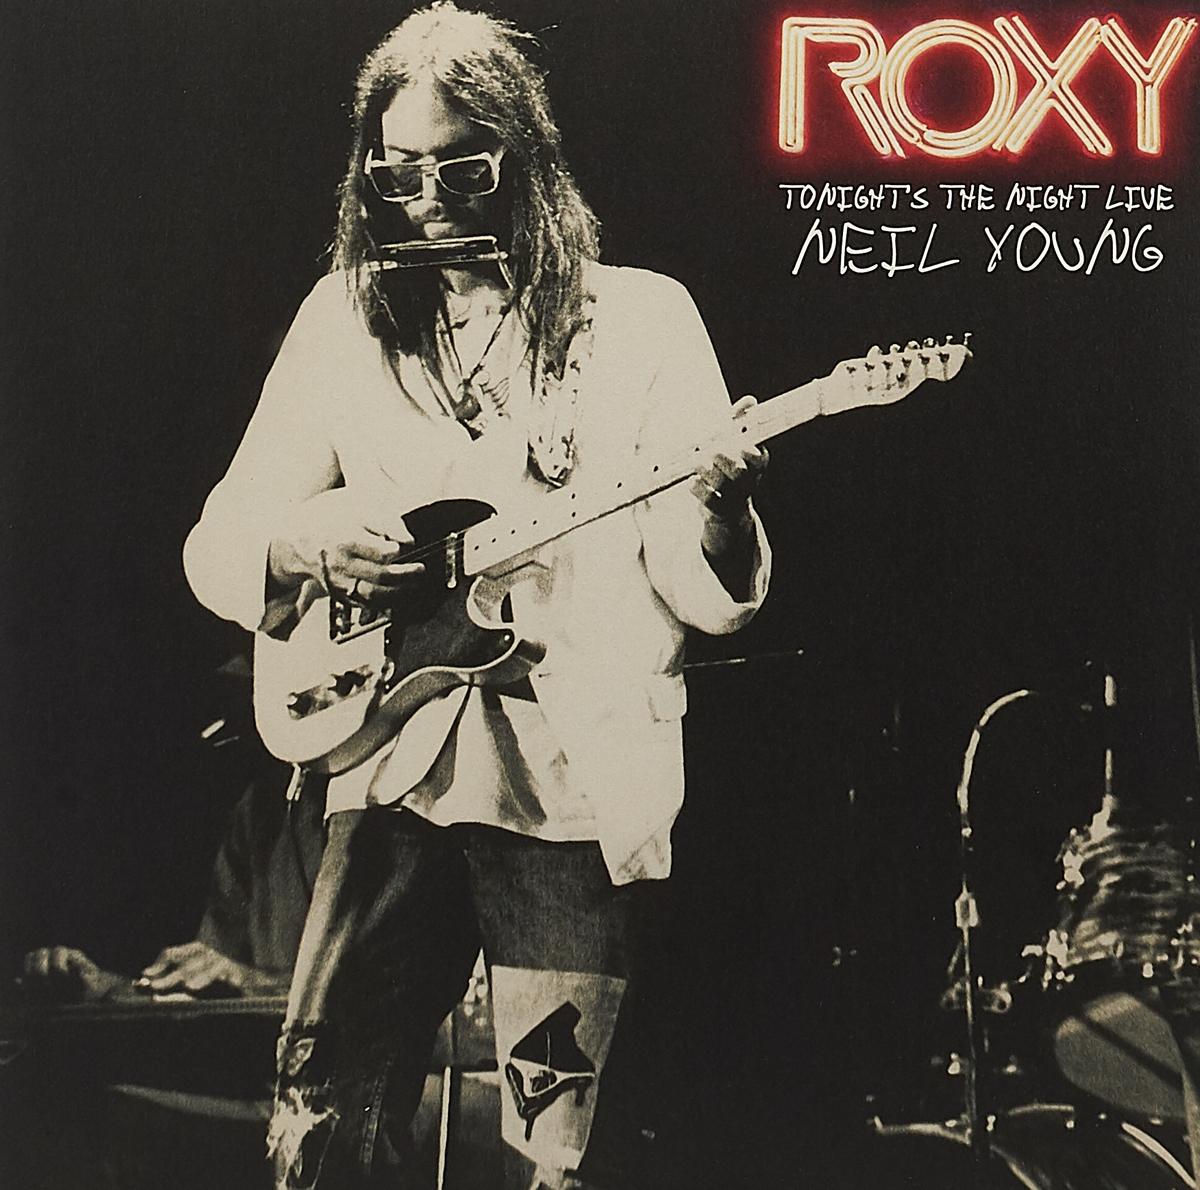 Нил Янг Neil Young, ROXY: Tonight's The Night Live (2 LP)